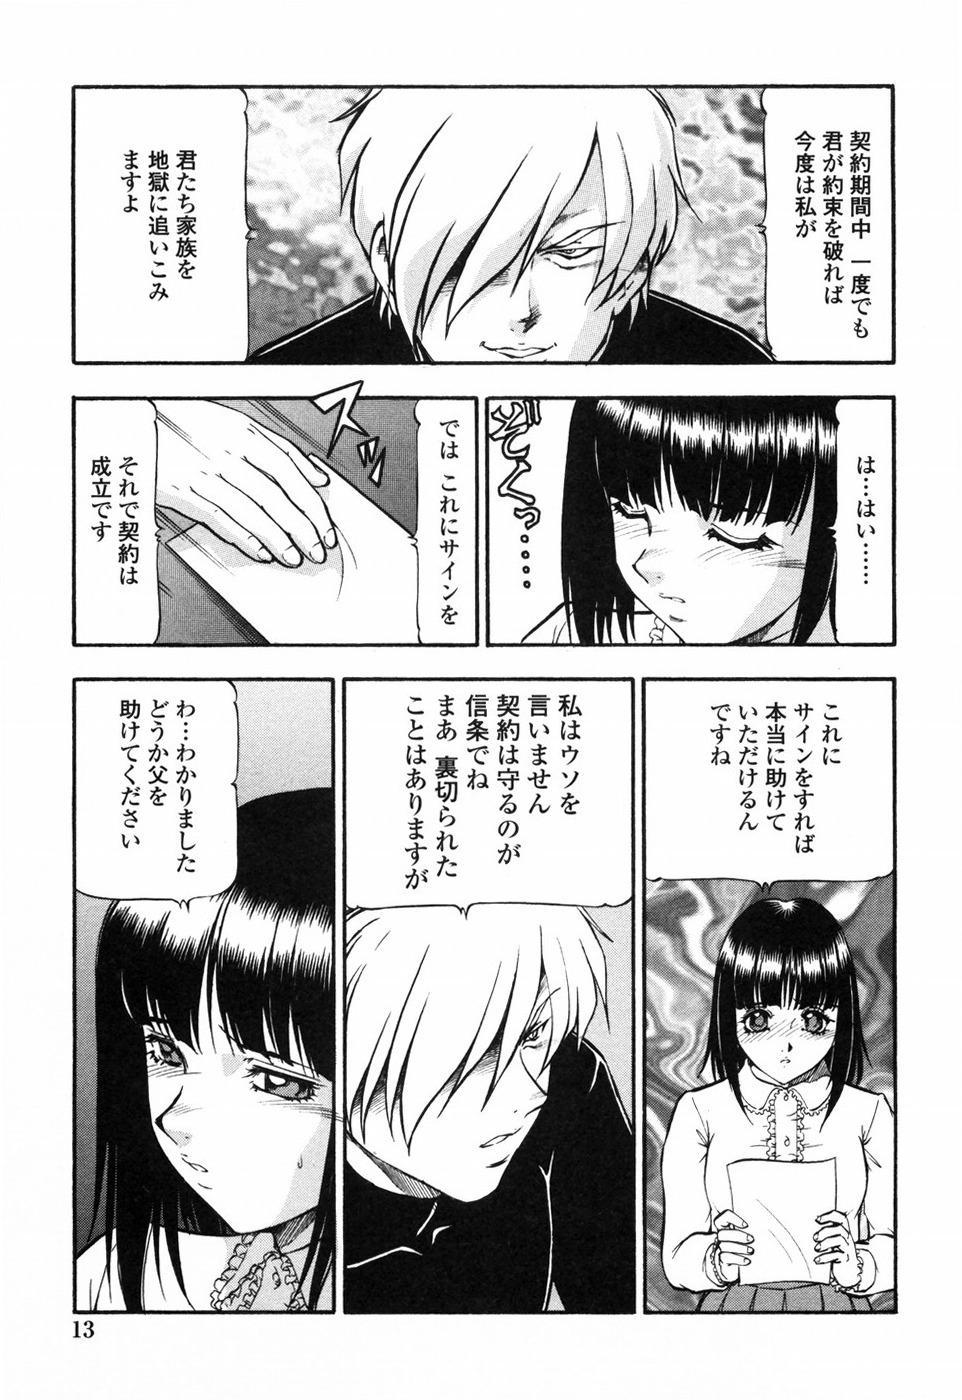 Kichiku Houteishiki - Equation of brutal person 18